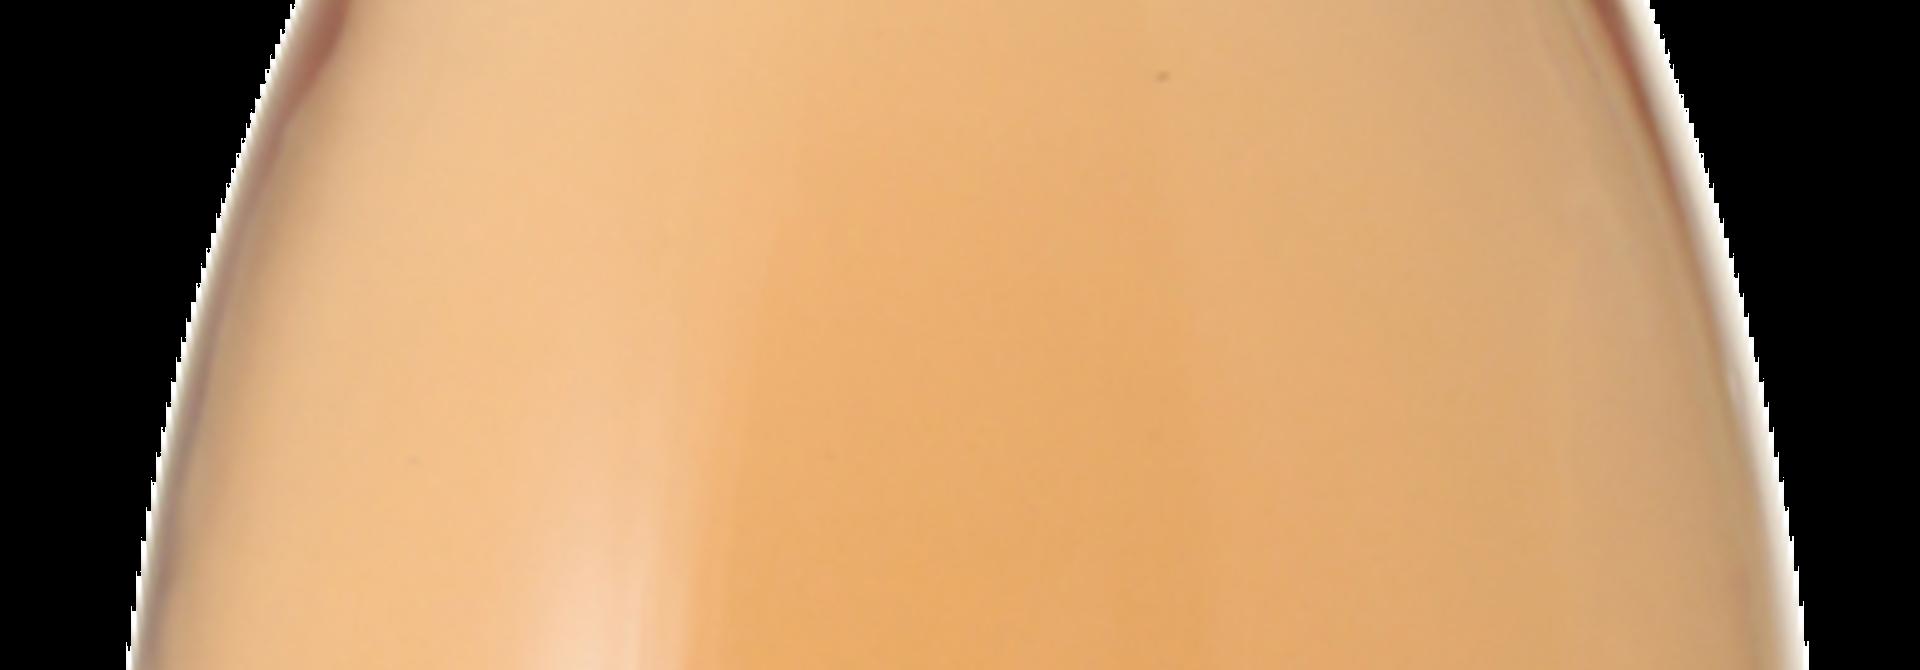 Estandon Héritage rosé 2020 - Magnum (1,5L)